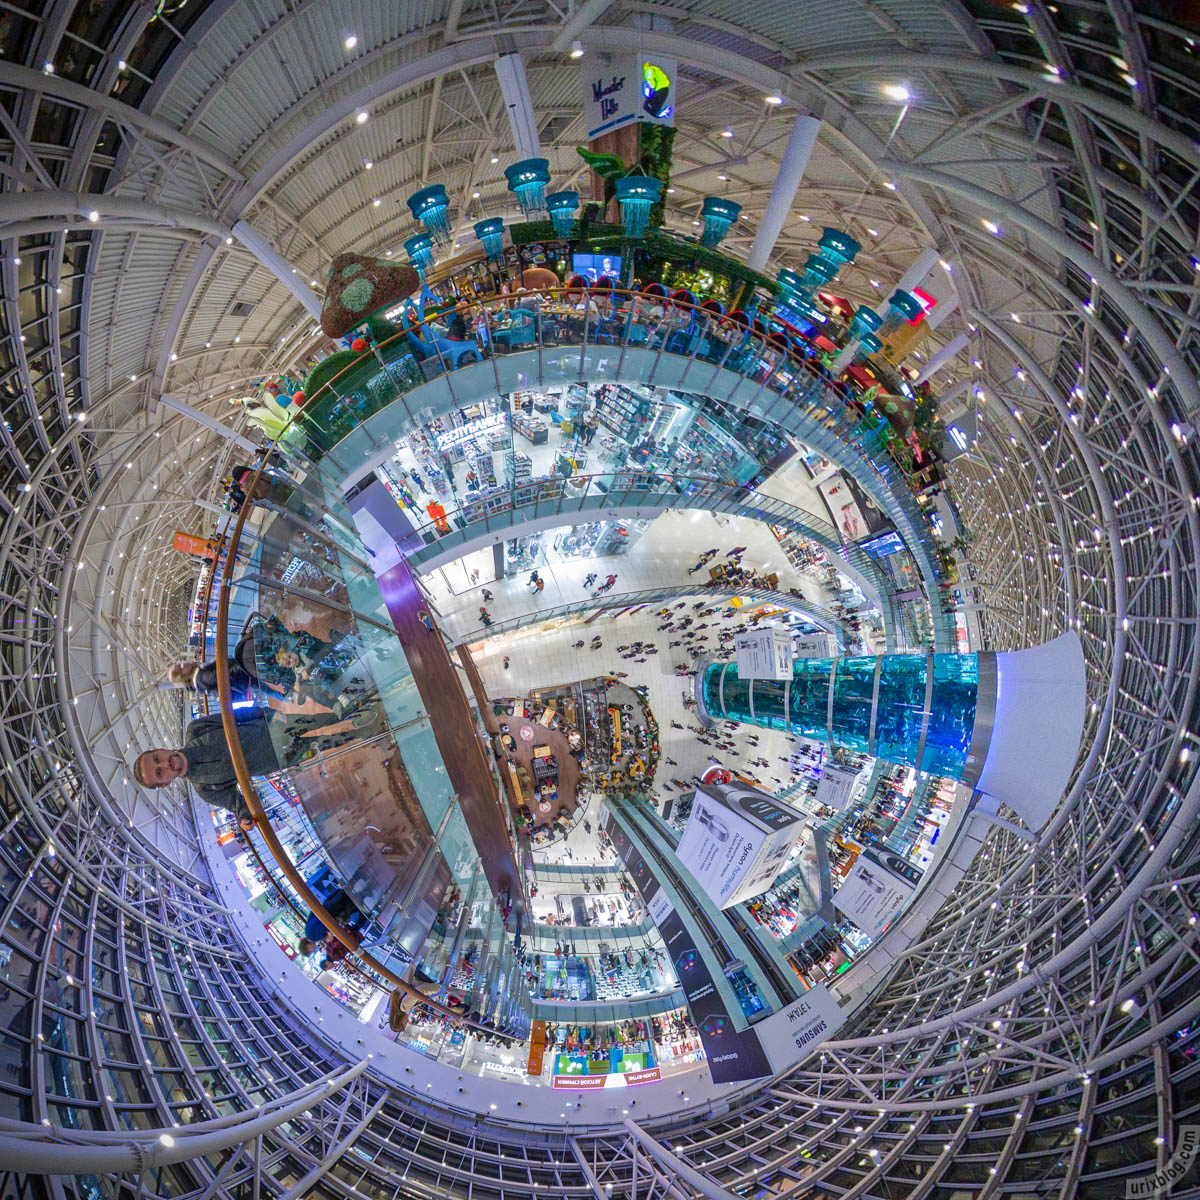 Авиапарк, Москва, Россия, фишай, панорама, Insta360 One X, 2019